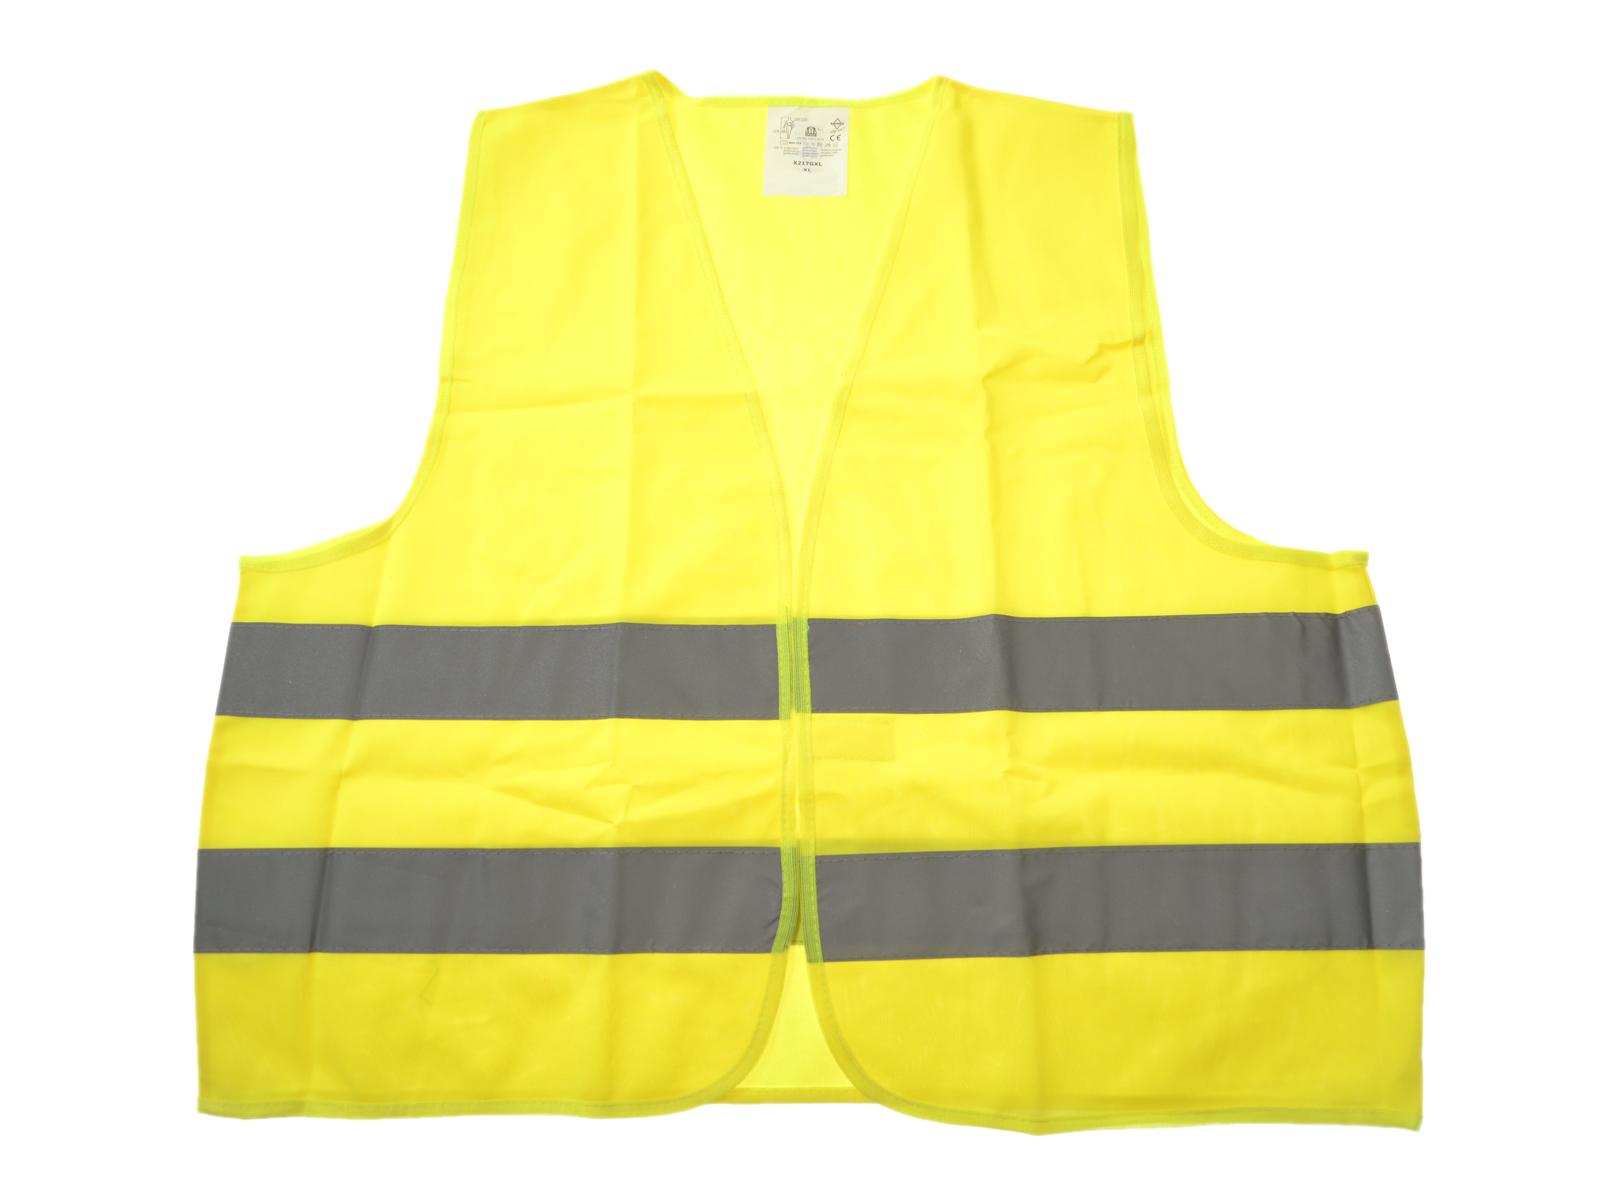 1x Warnweste KFZ gelb DIN EN ISO 20471 in XL für TÜV-HU